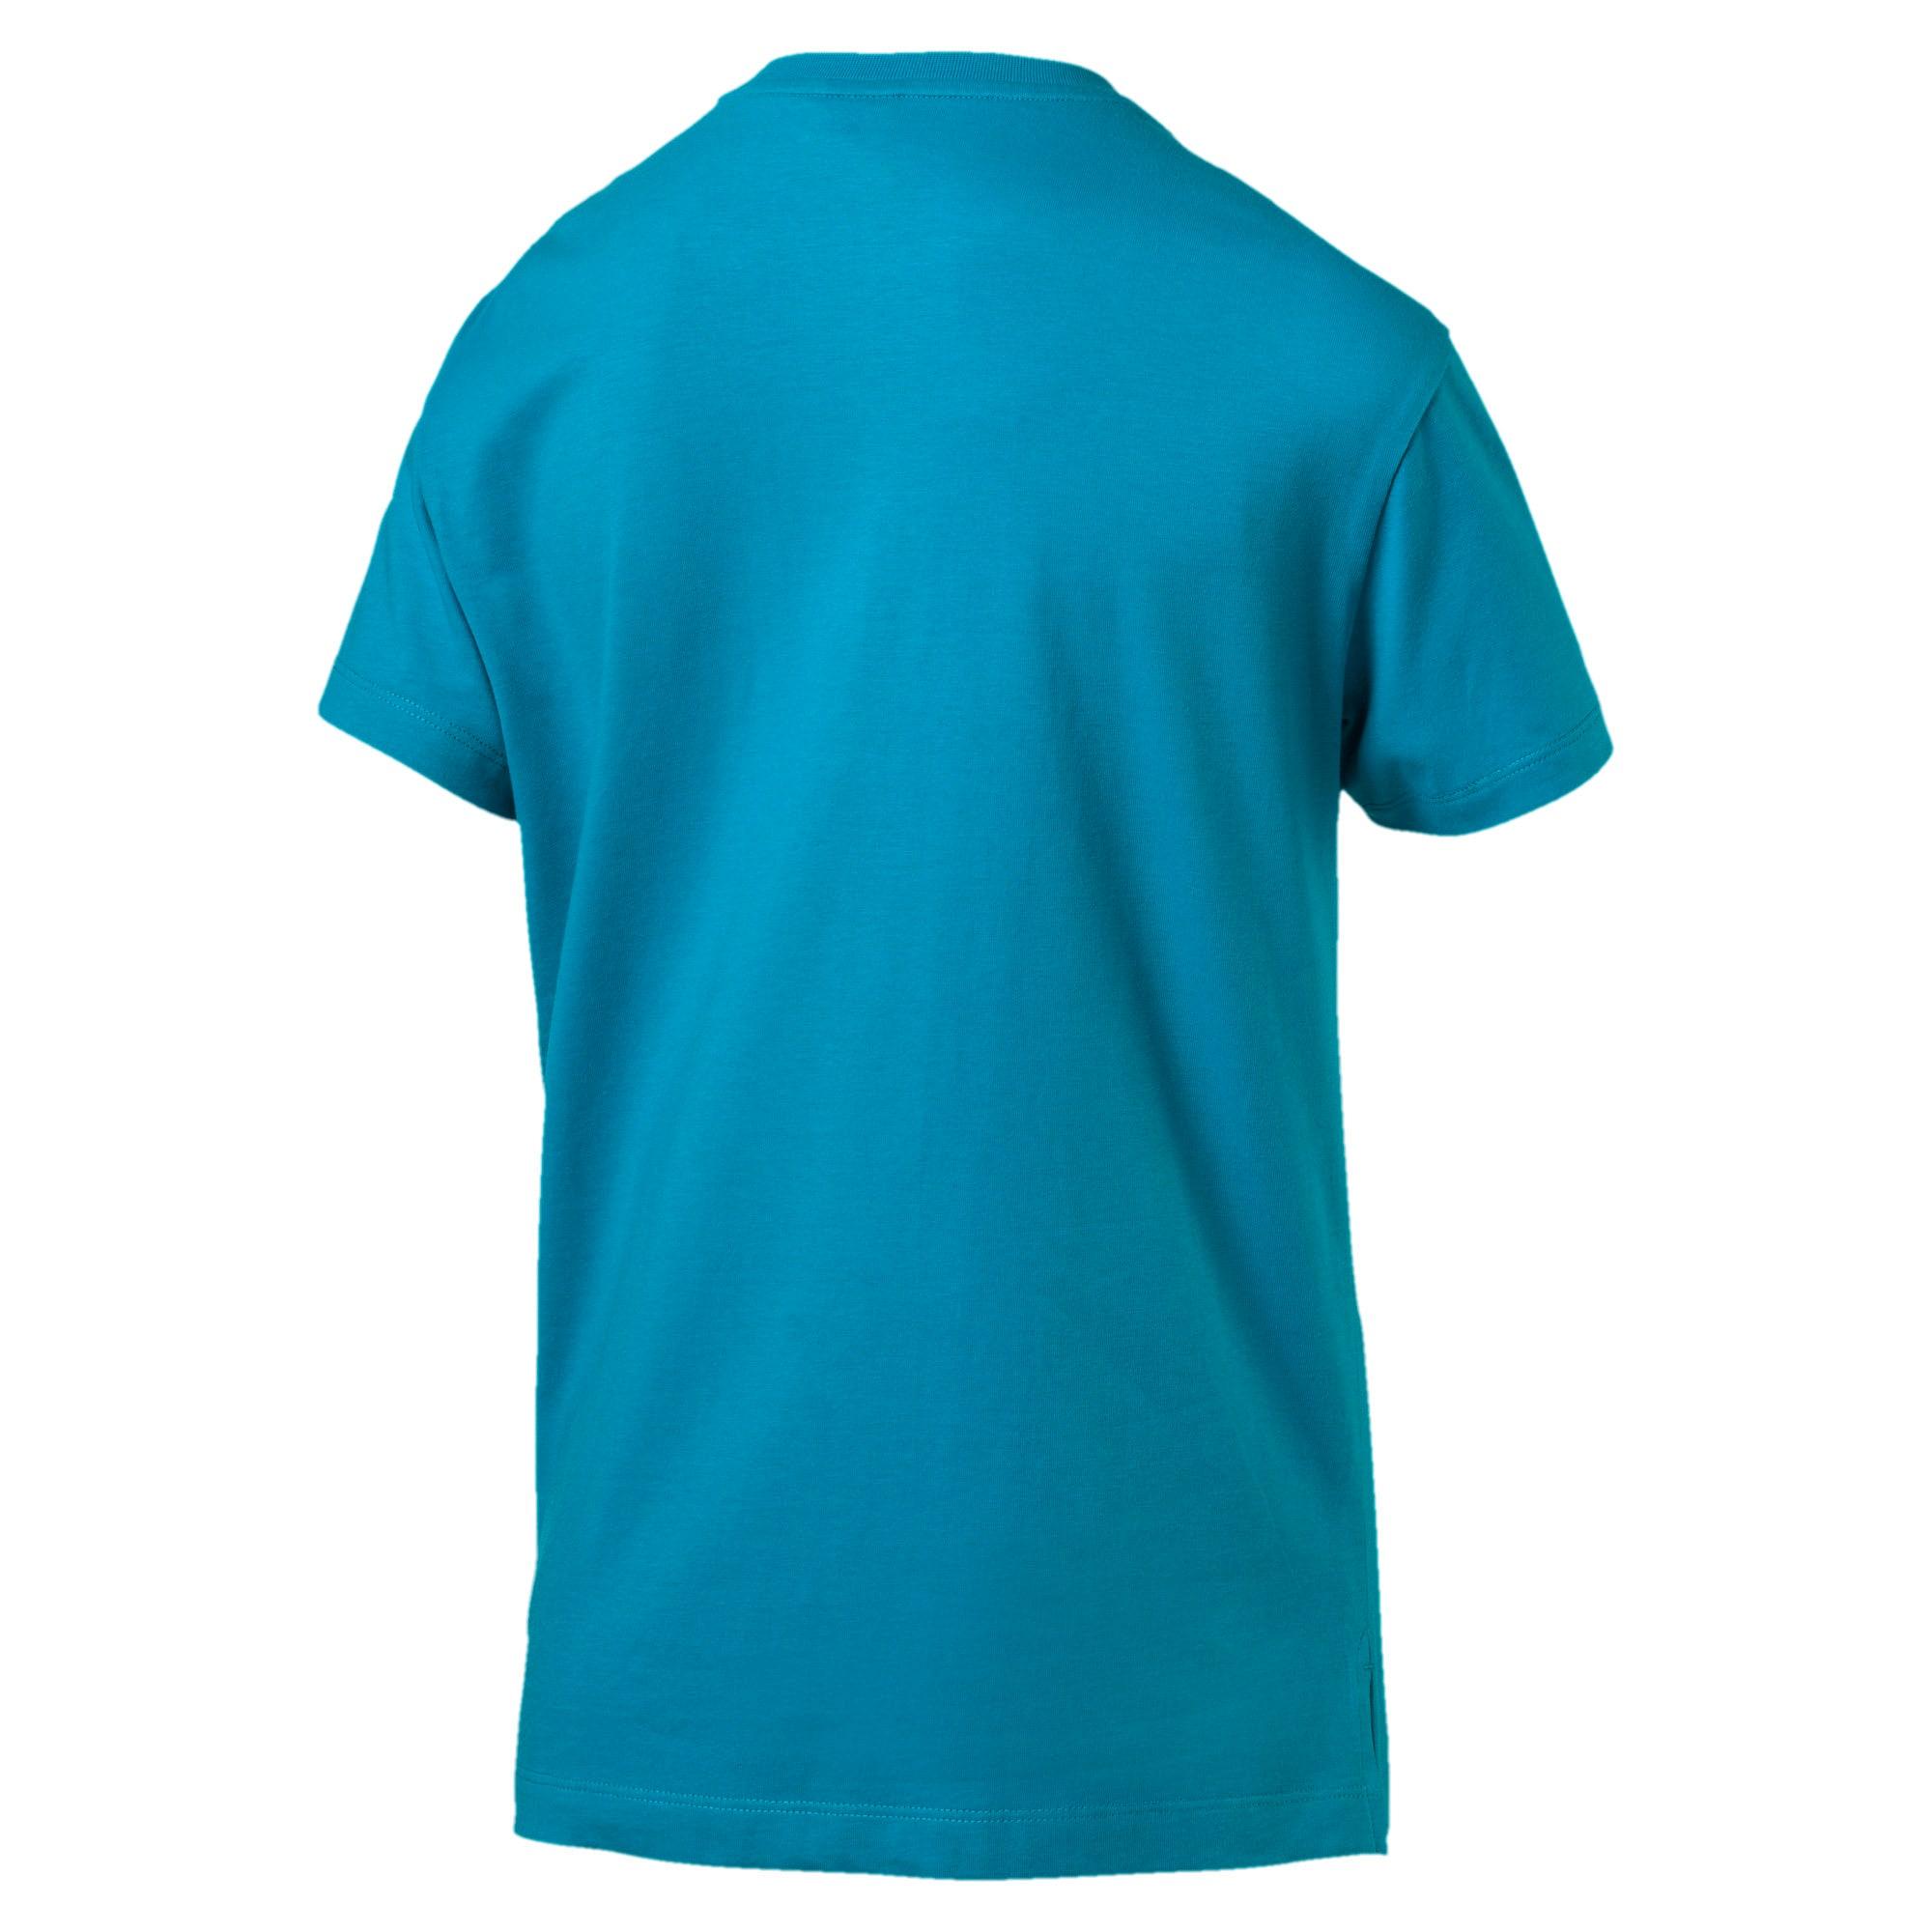 Miniatura 2 de Camiseta Classics con logotipo para mujer, Caribbean Sea, mediano